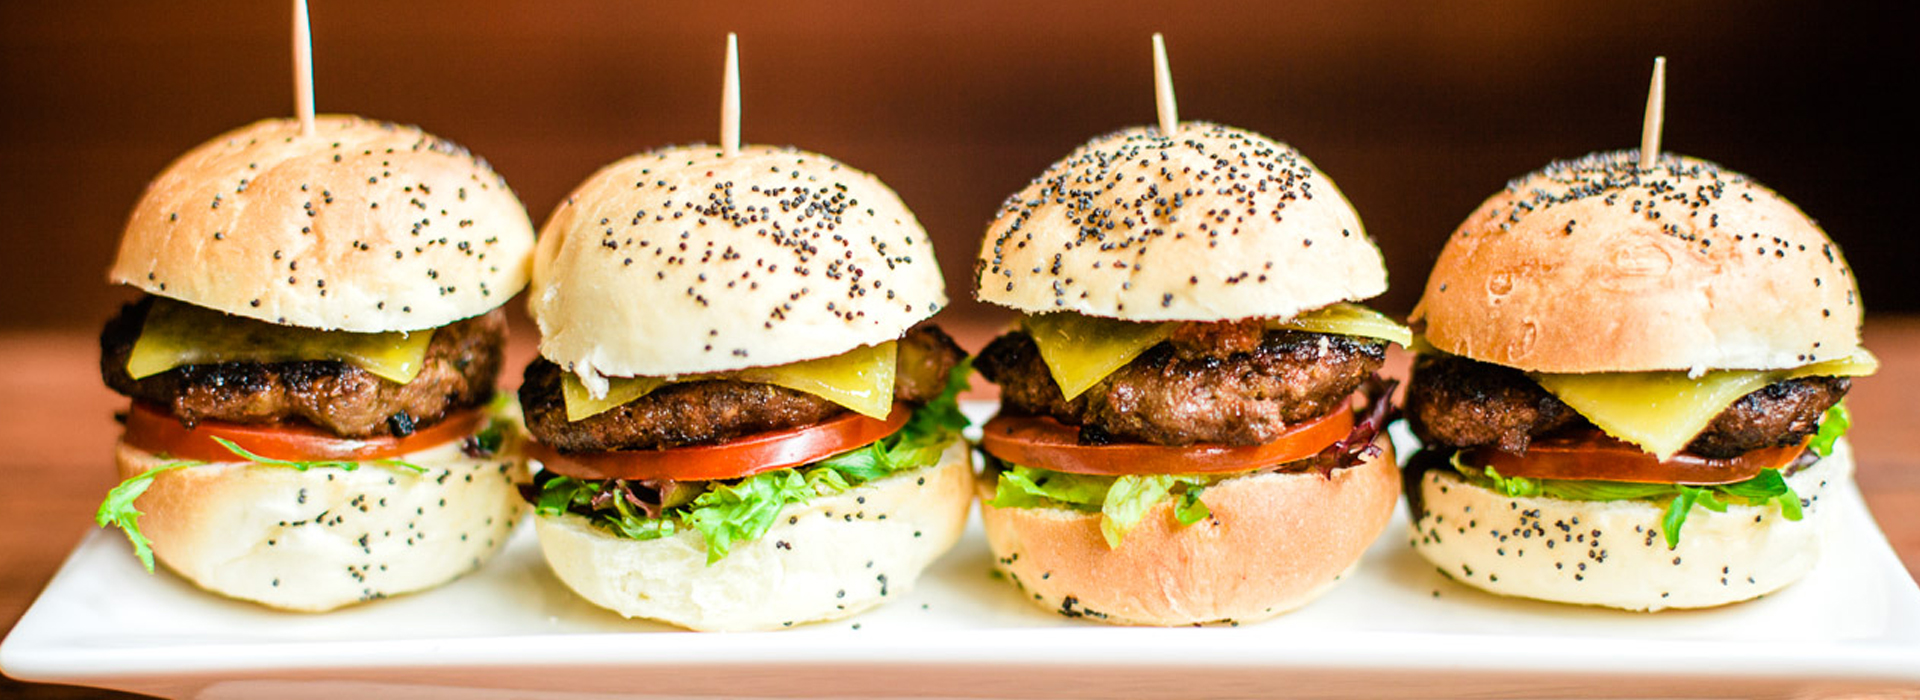 restaurant hawthorn hamburgers